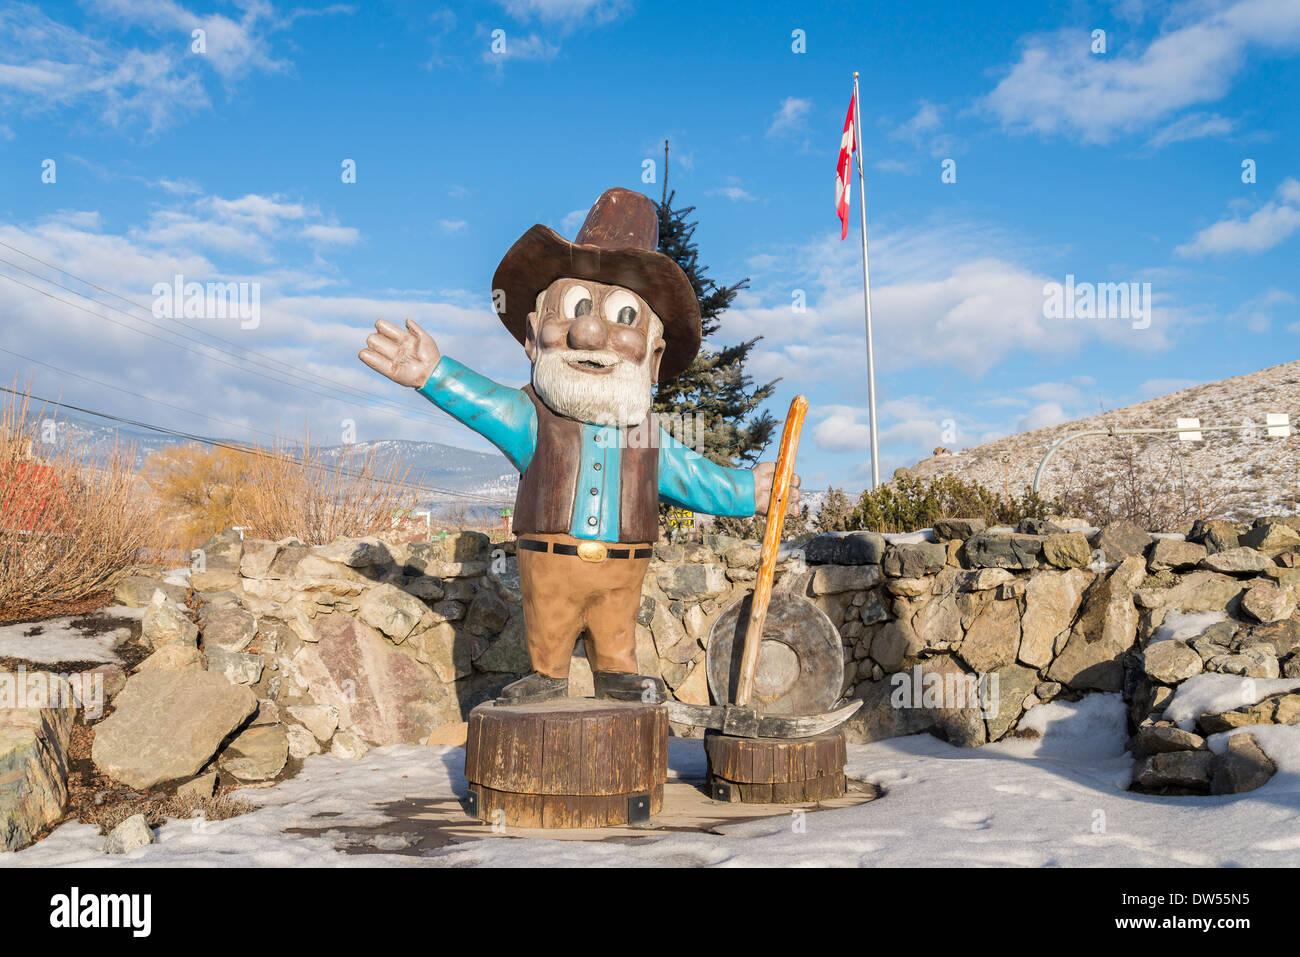 Gold Miner, prospector town mascot, Cache Creek, British Columbia, Canada - Stock Image